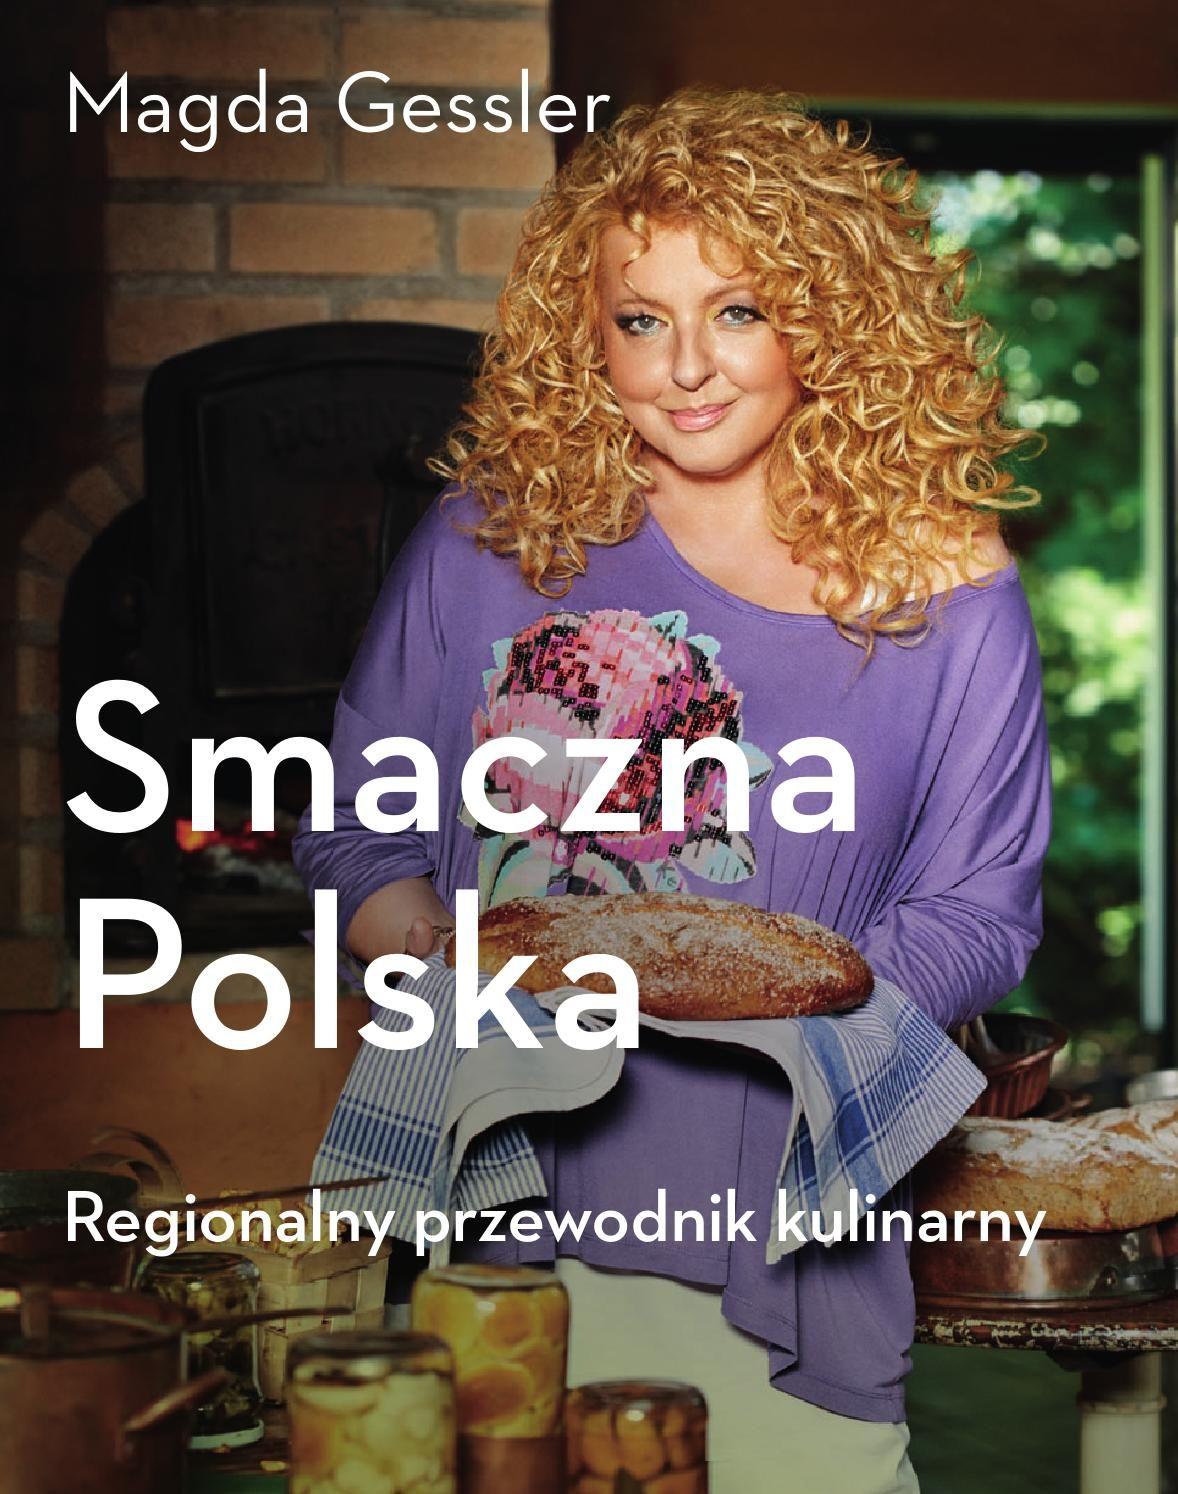 Smaczna Polska Regionalny Przewodnik Kulinarny Magda Gessler Polish Recipes Cooking Recipes Food And Drink